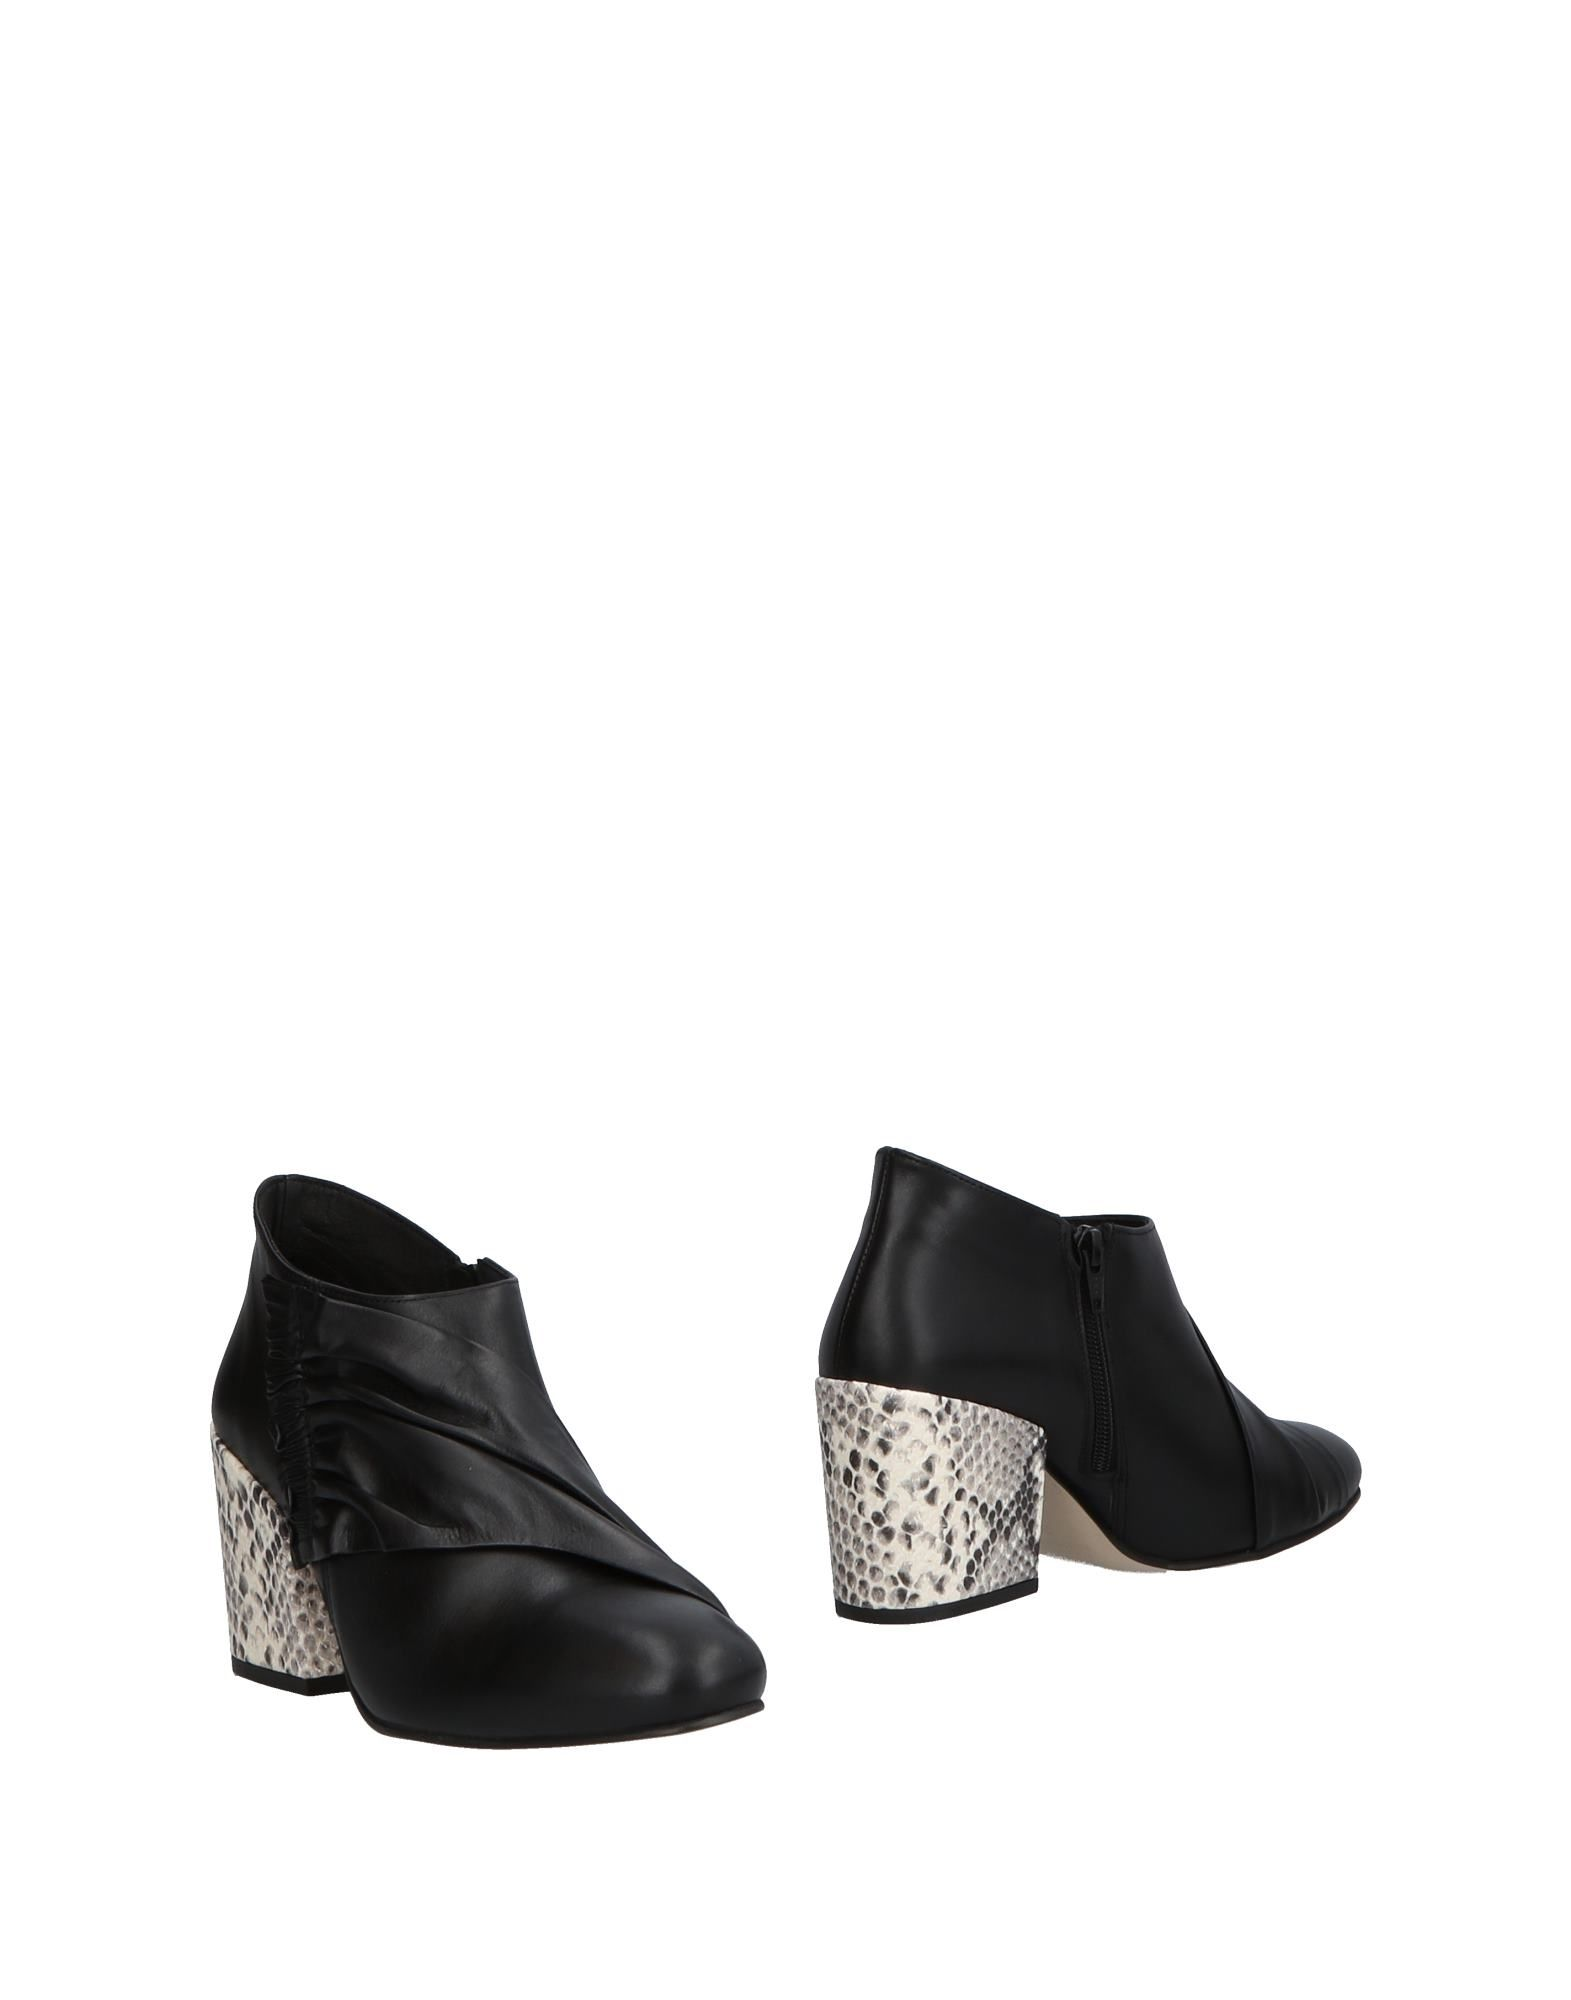 Kmb Stiefelette Gute Damen  11506048FG Gute Stiefelette Qualität beliebte Schuhe d52d8d